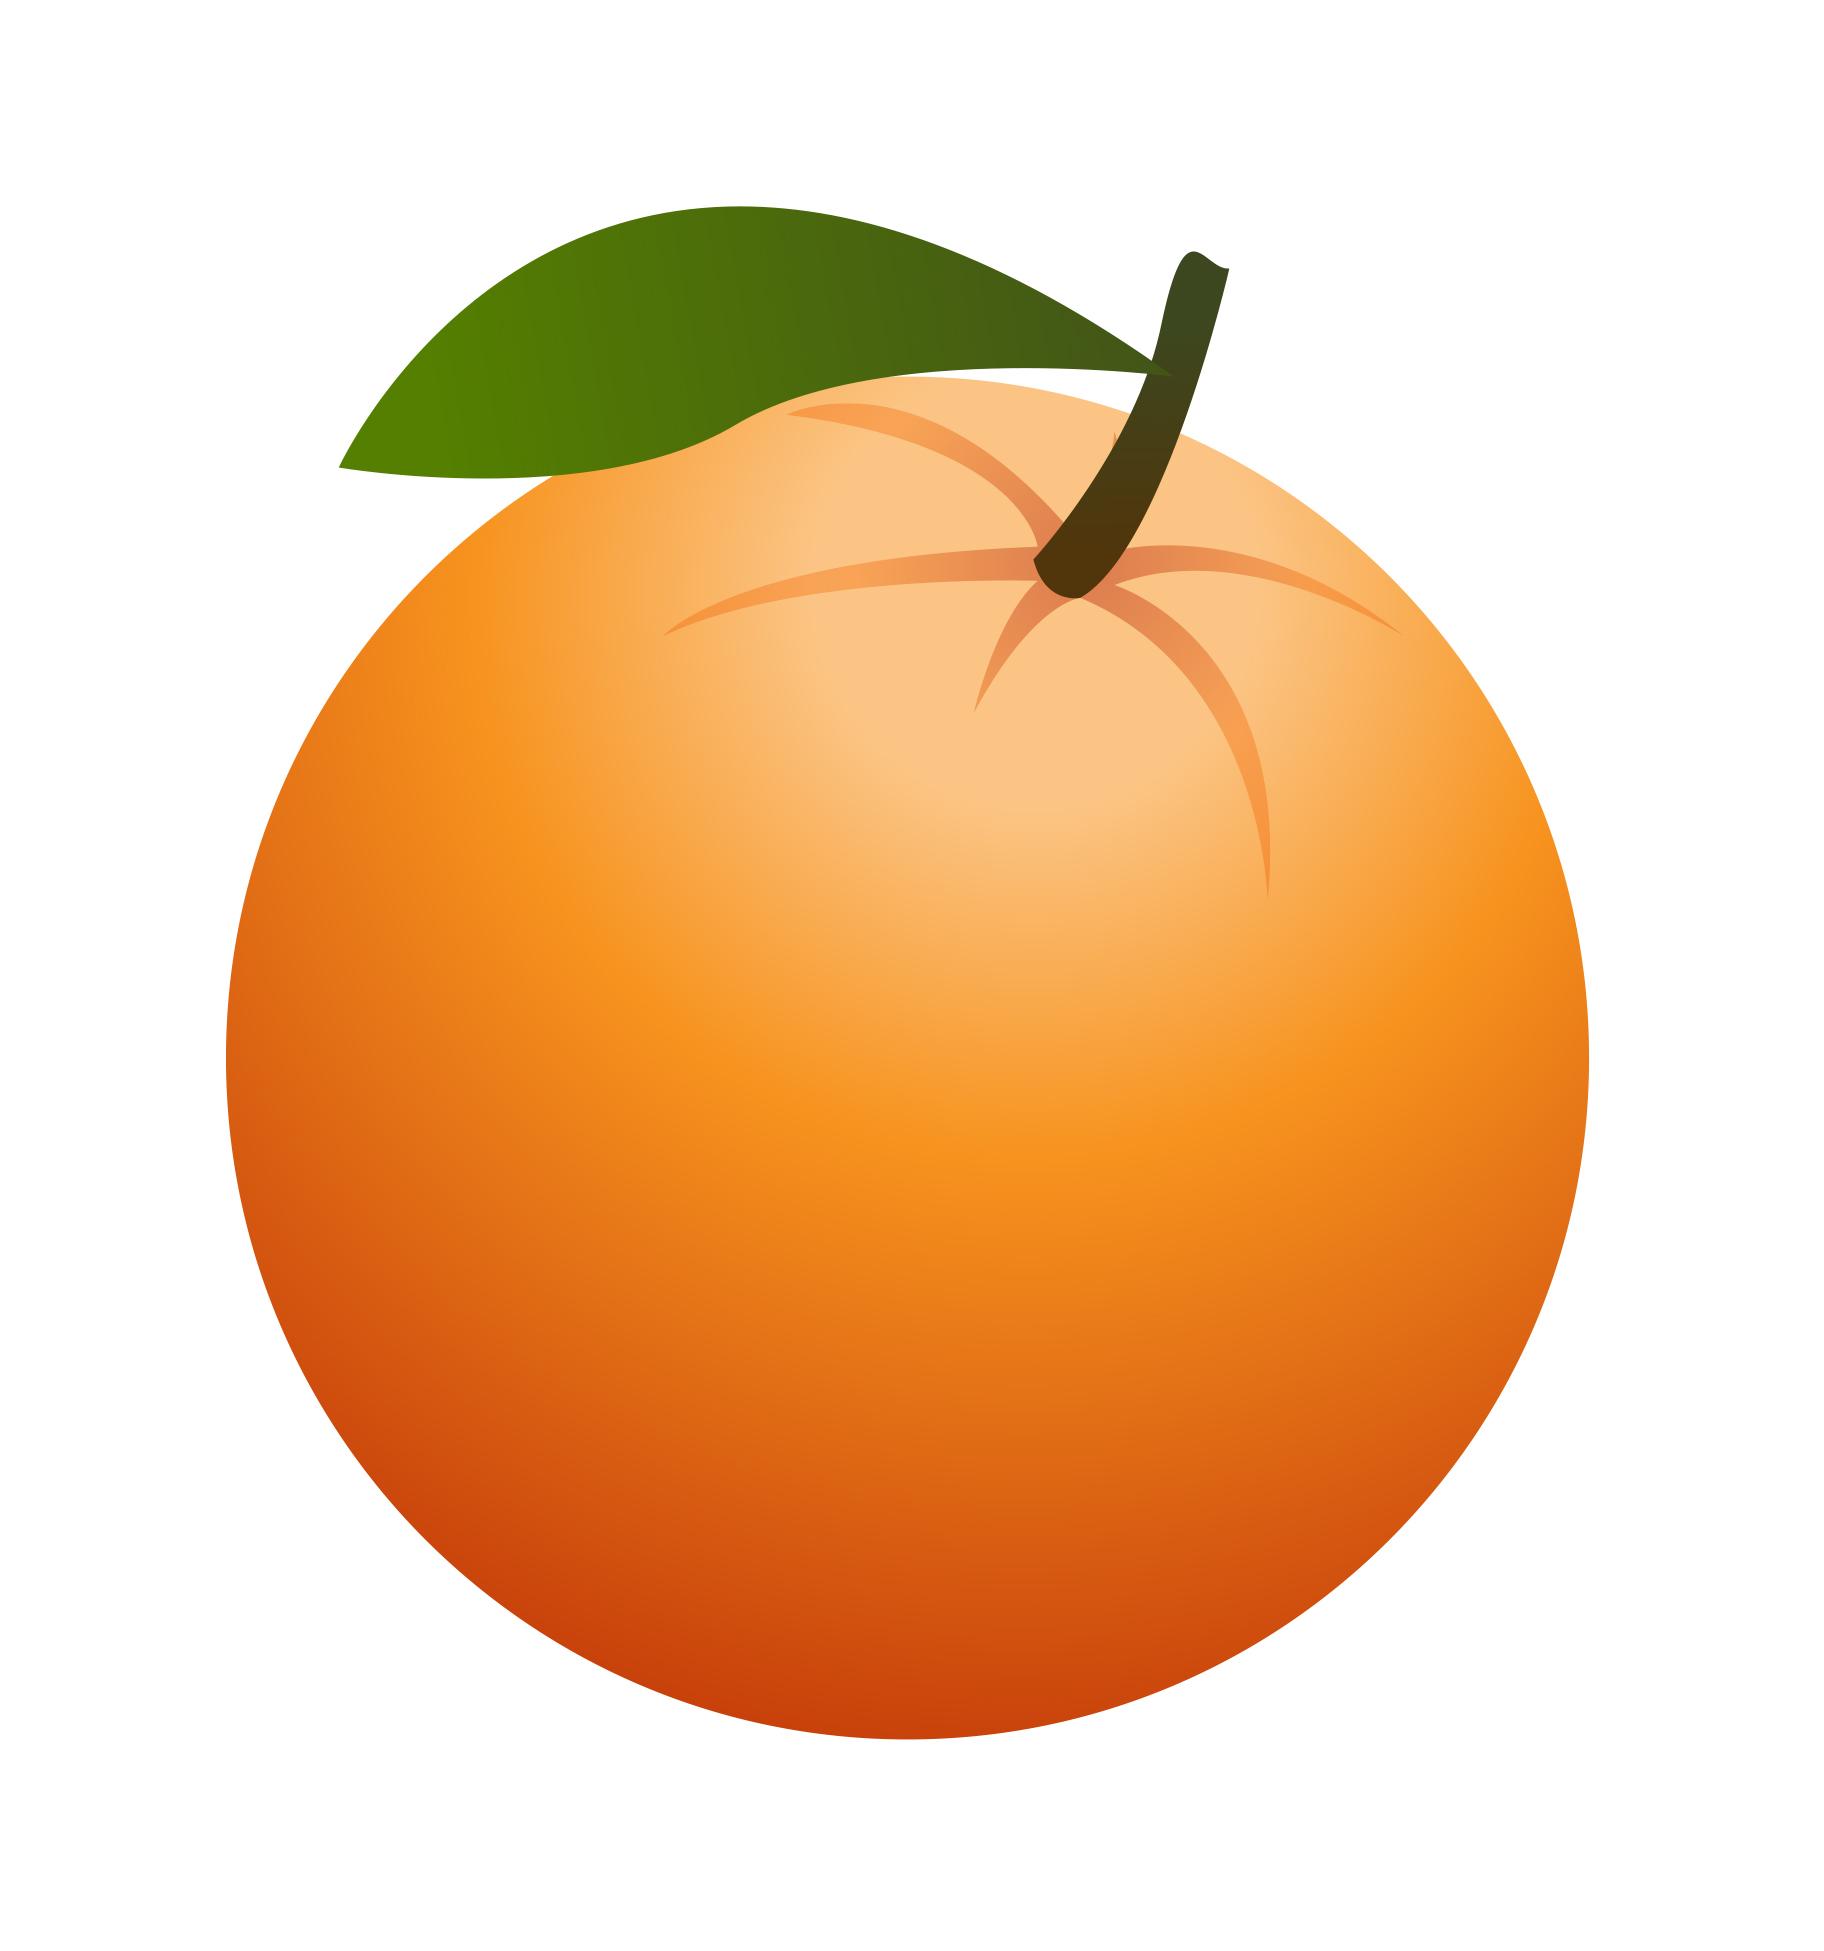 Orange clipart #9, Download drawings